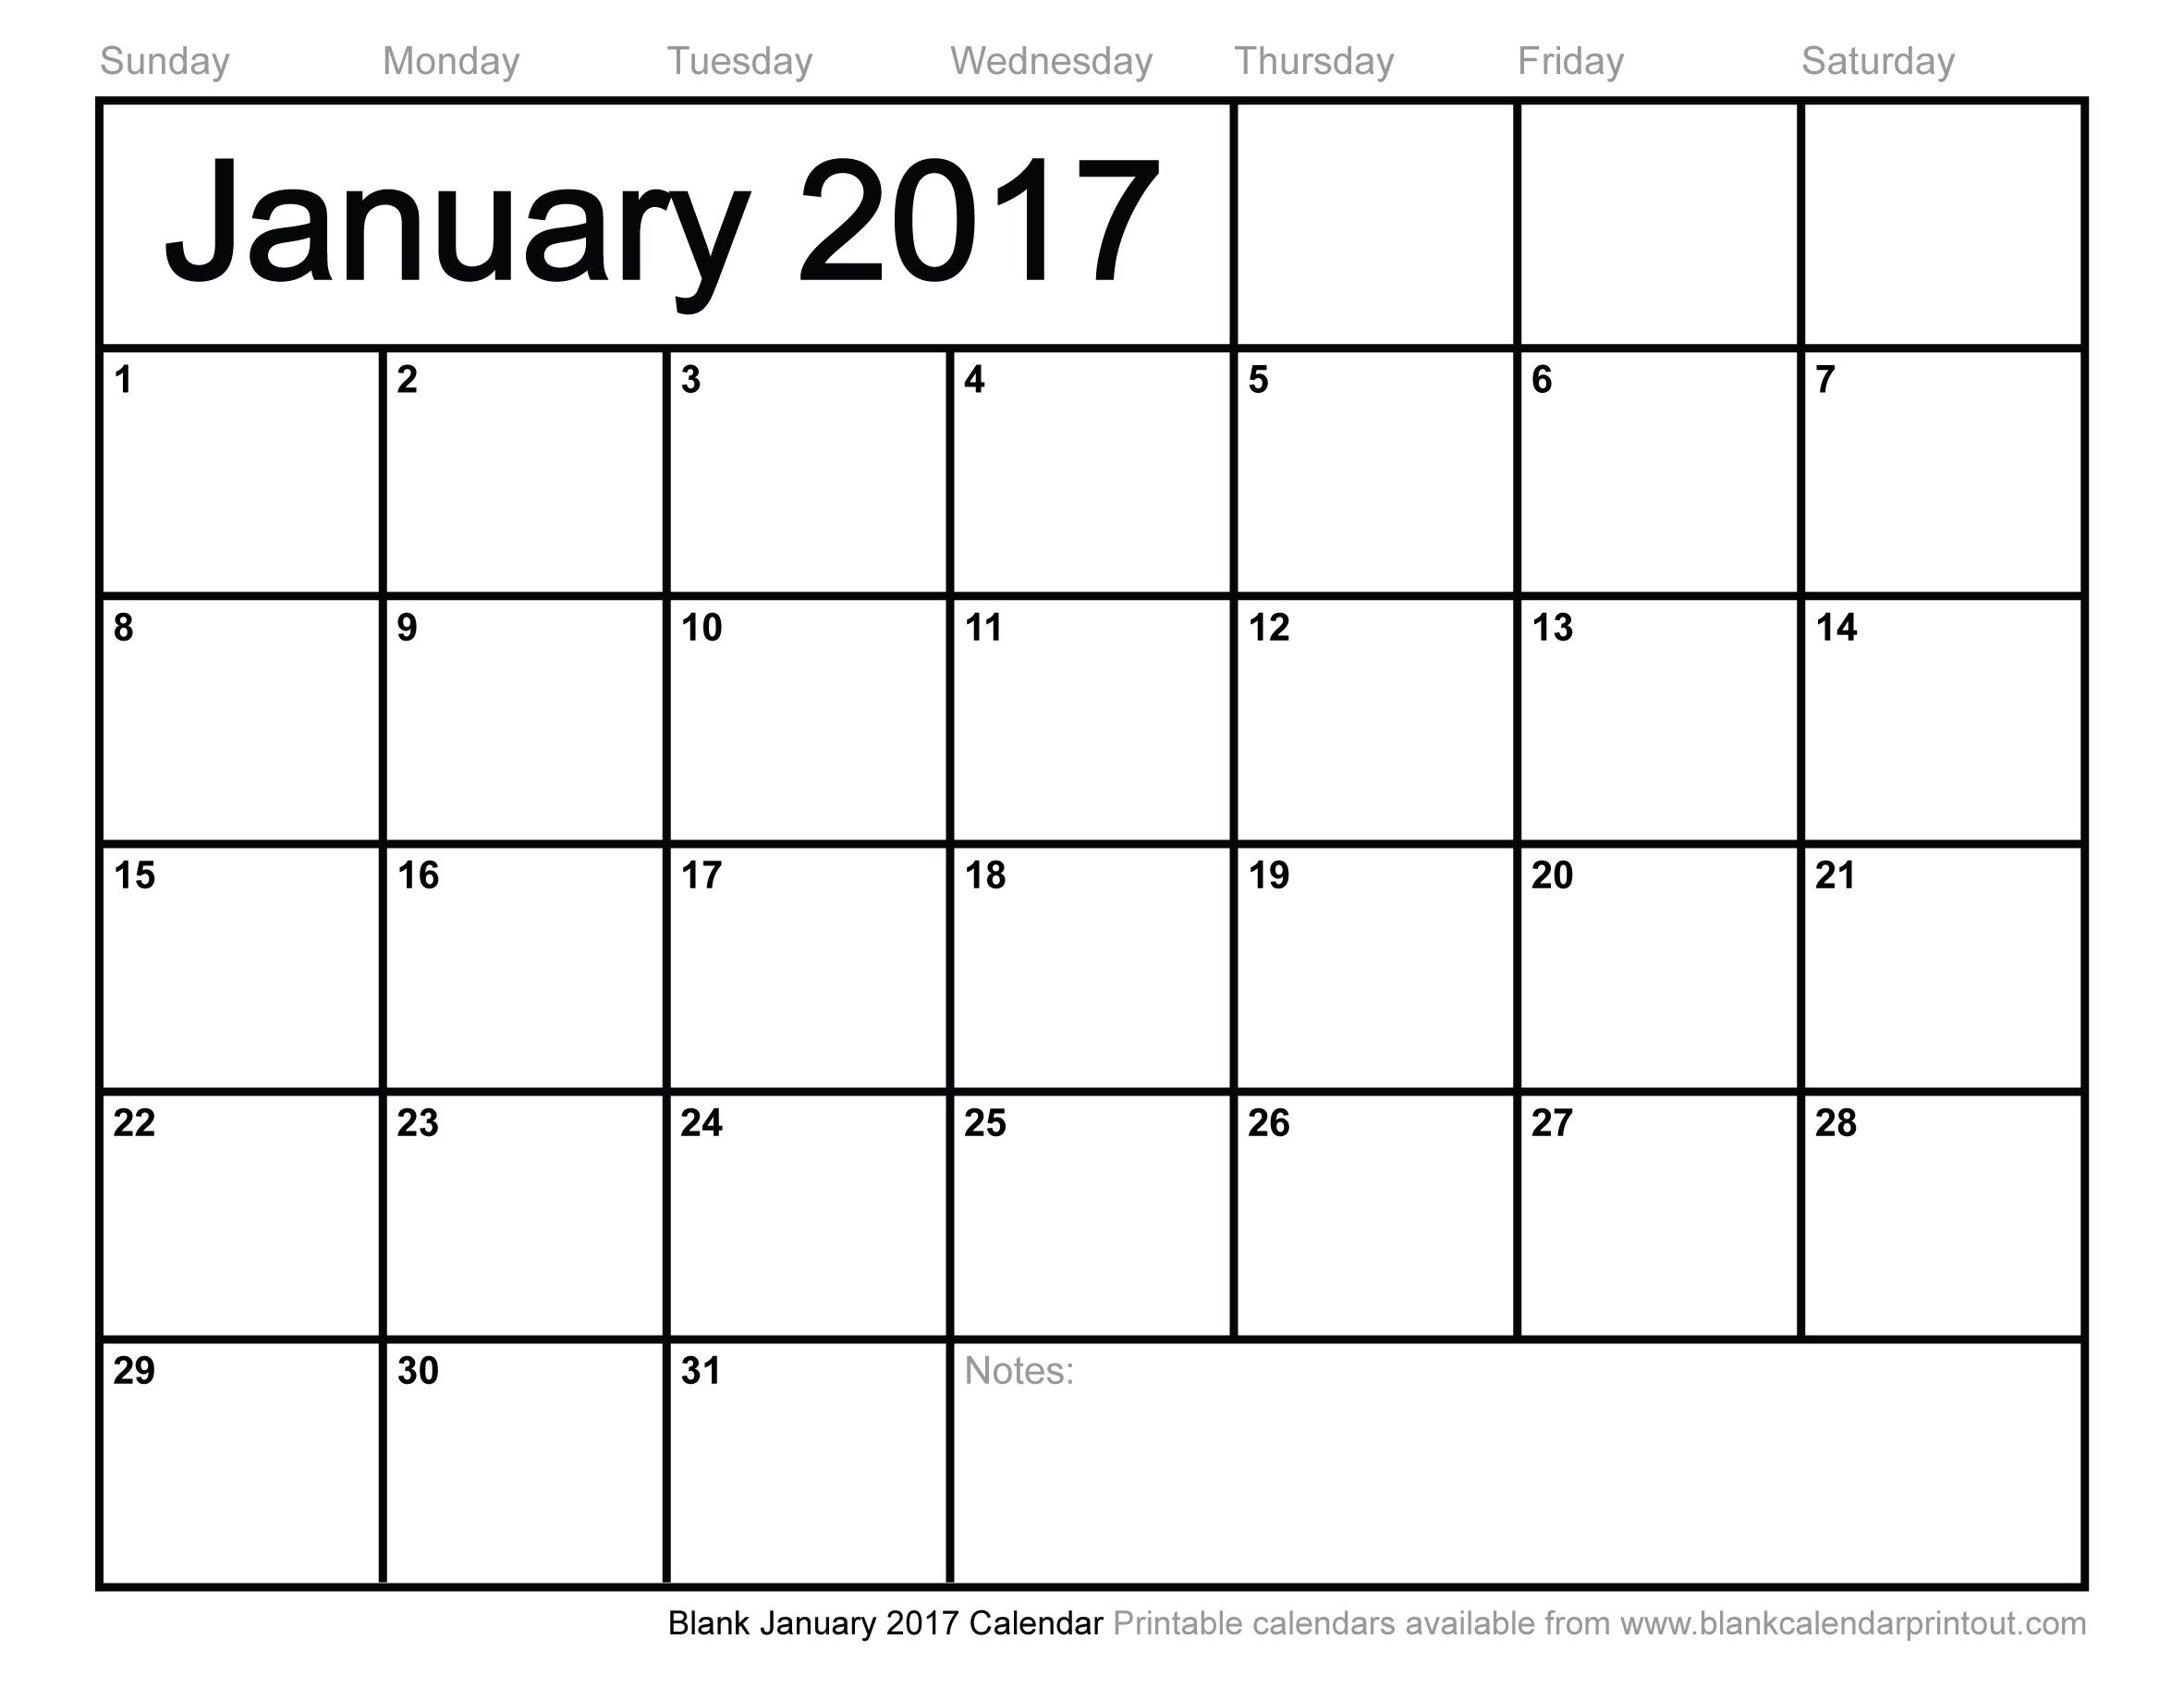 January Calendar Templates  Topa.mastersathletics.co for Blogilates December 2020 Calendar